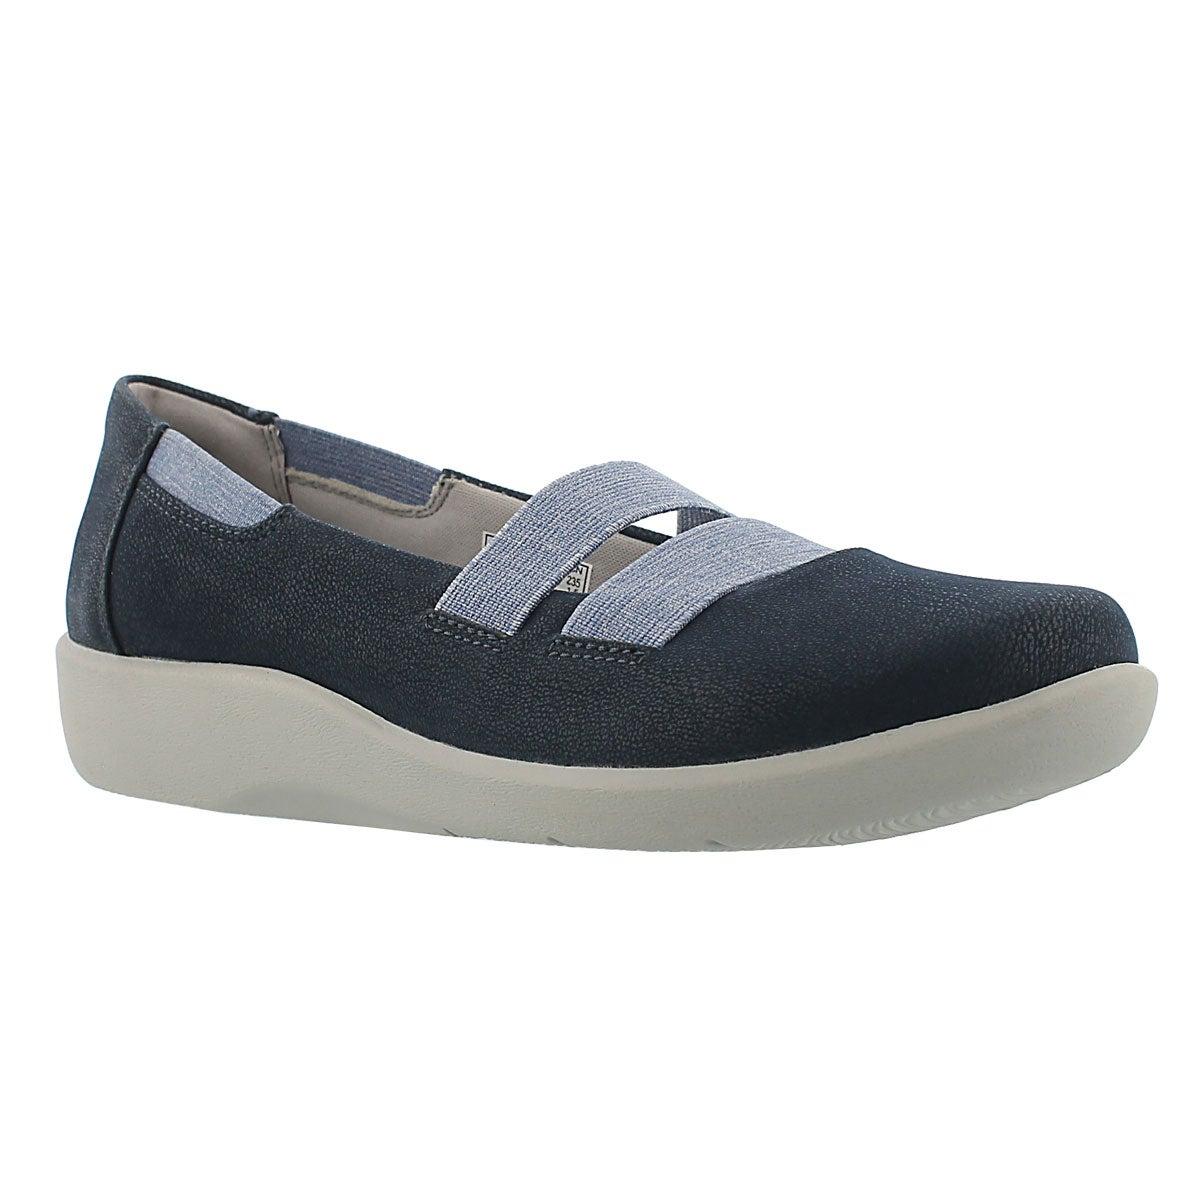 Women's SILLIAN REST navy slip on casual shoes